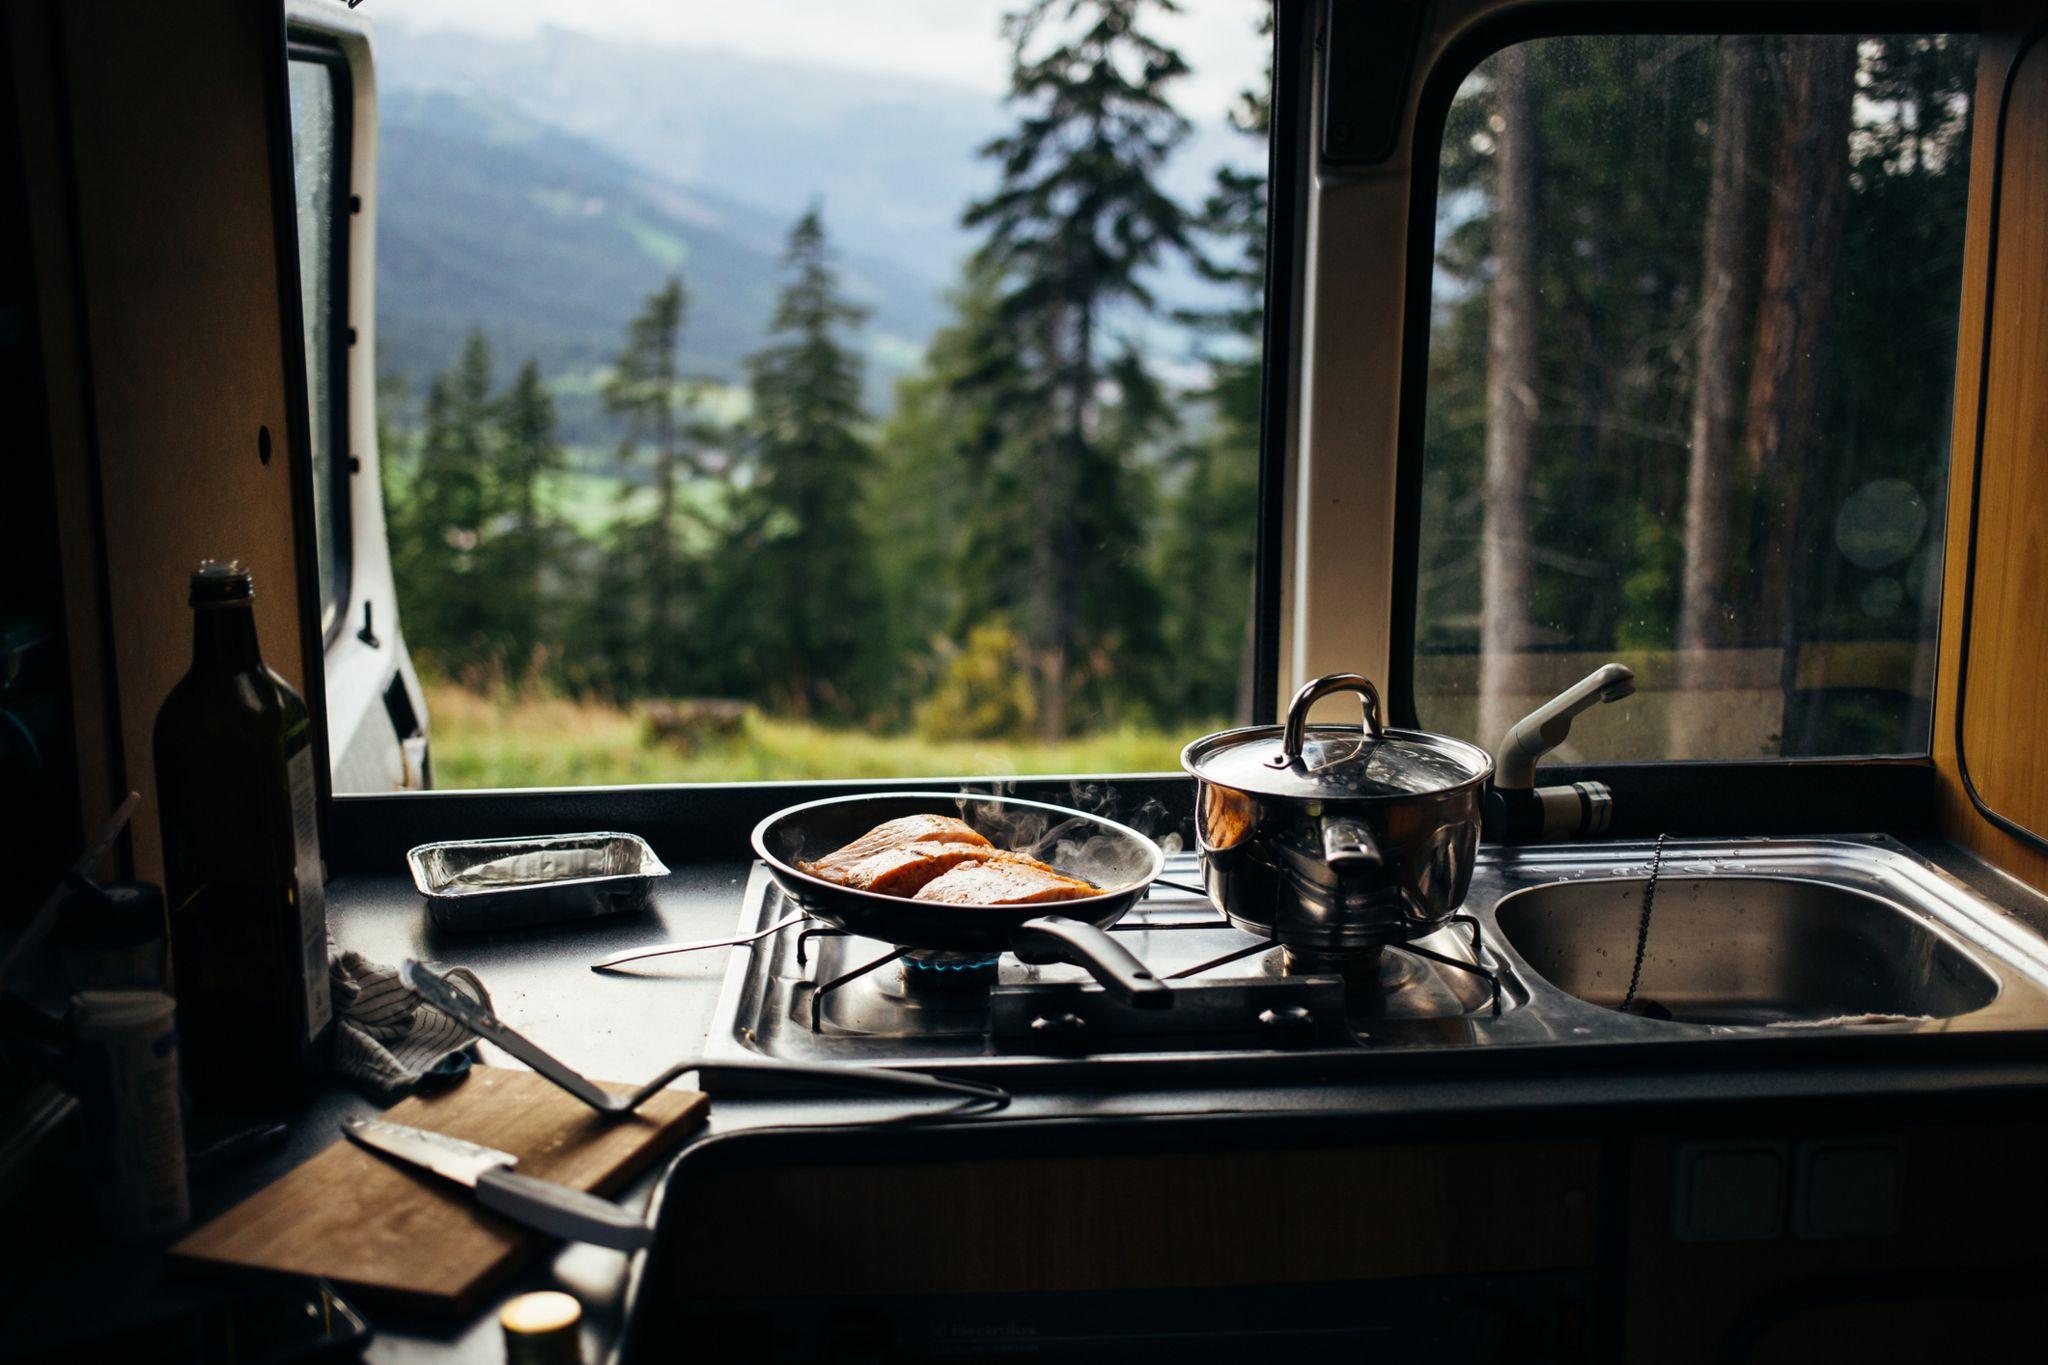 Hobs in a campervan